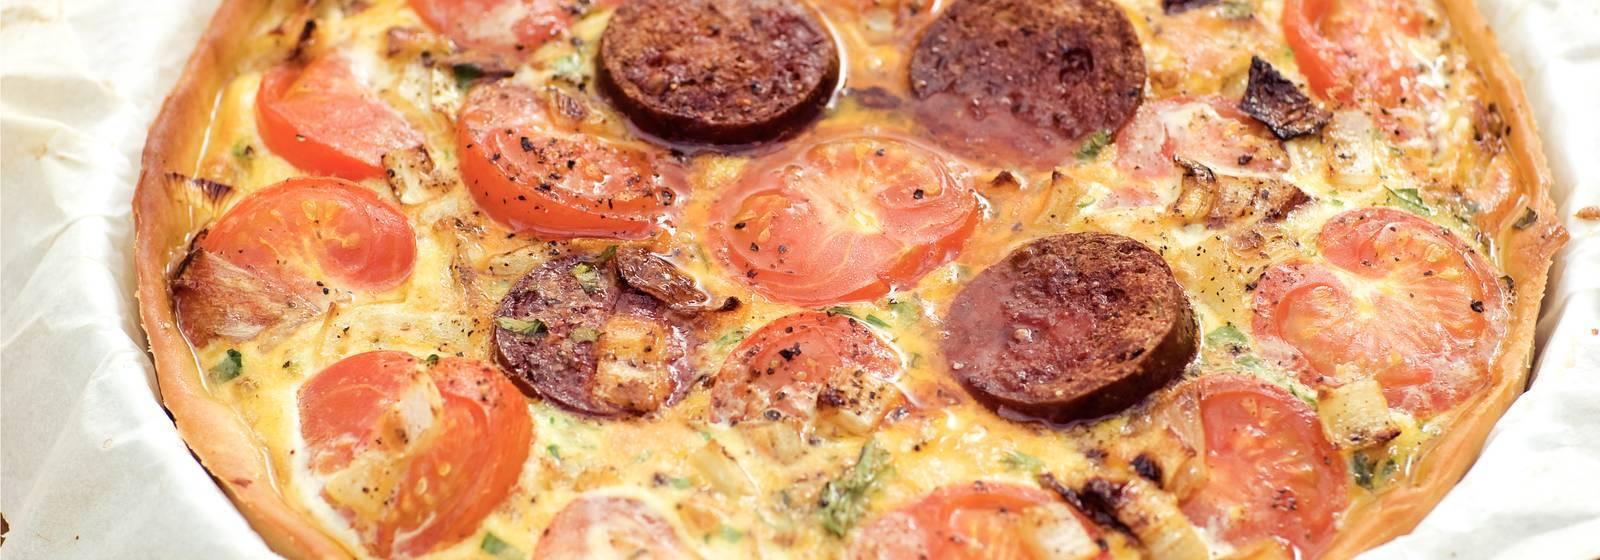 Spanish Tomato pie